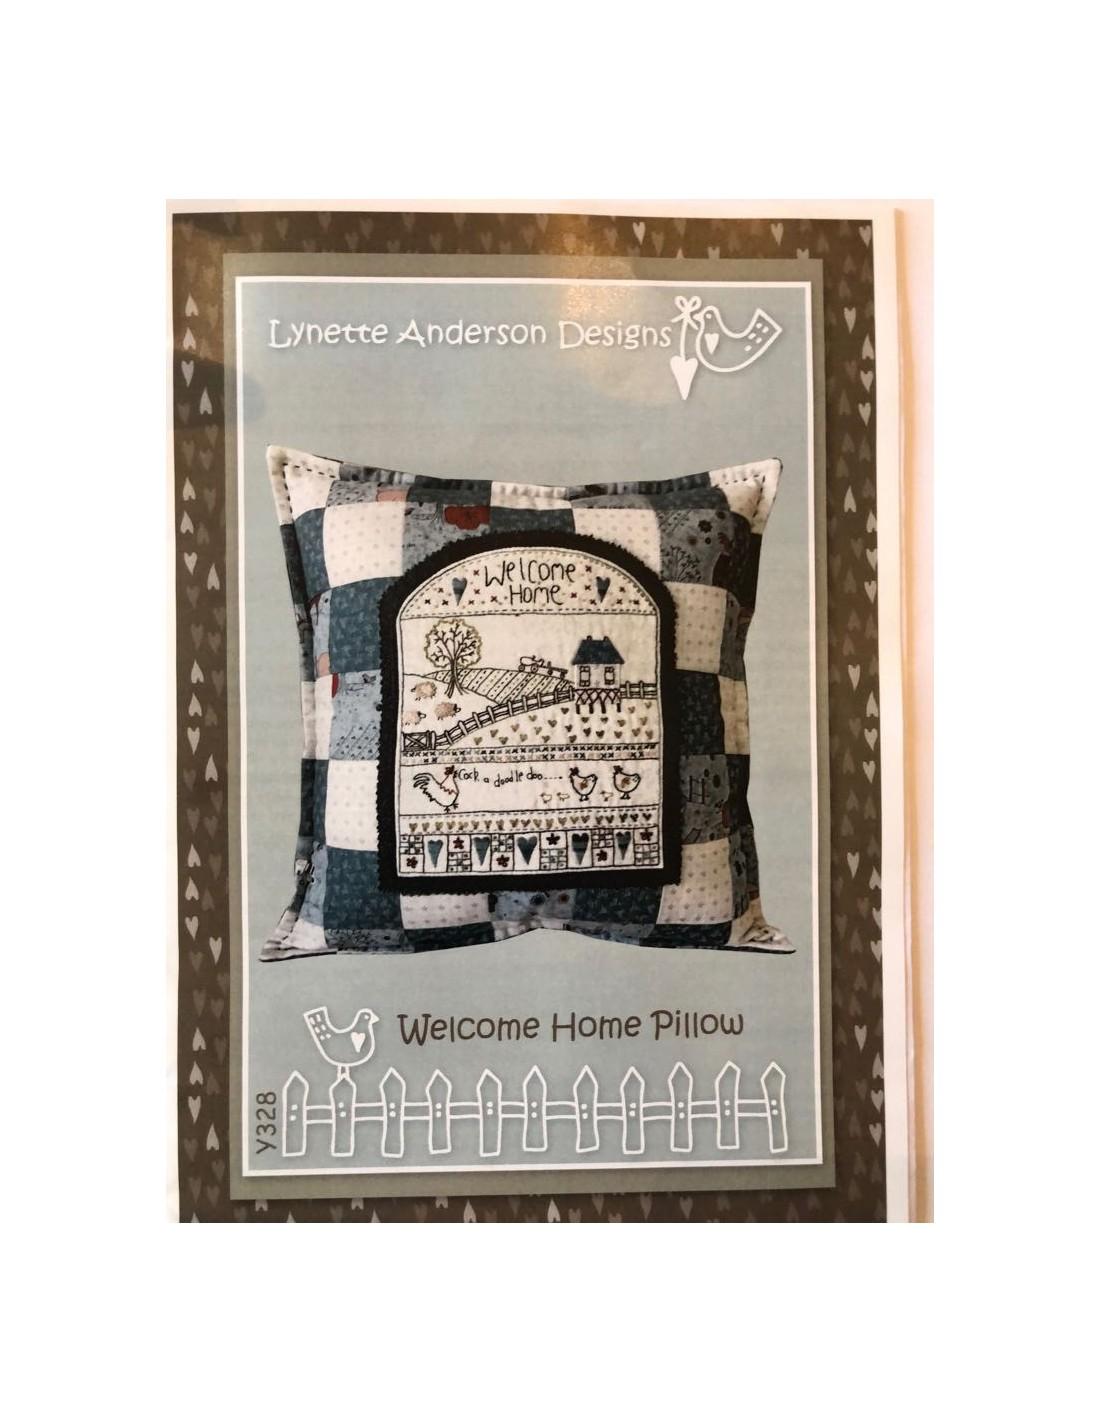 Patrón y botones cojín Welcome Home Pillow Lynette Anderson